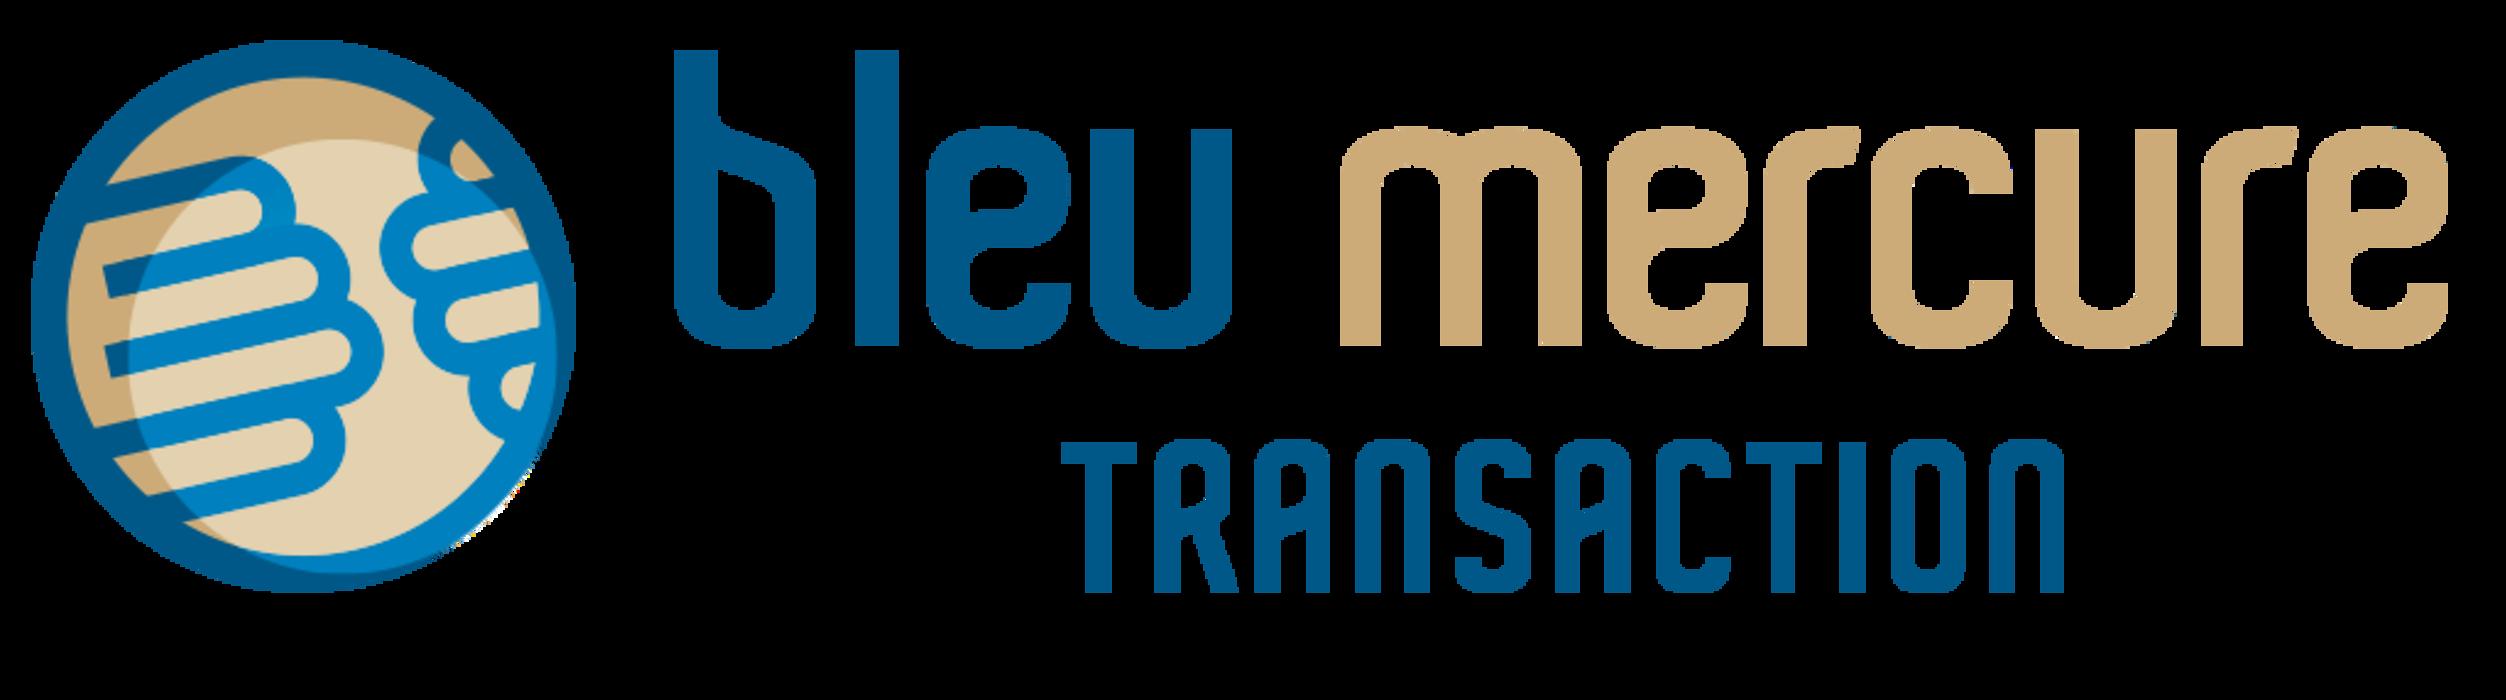 Bleu mercure transaction 0